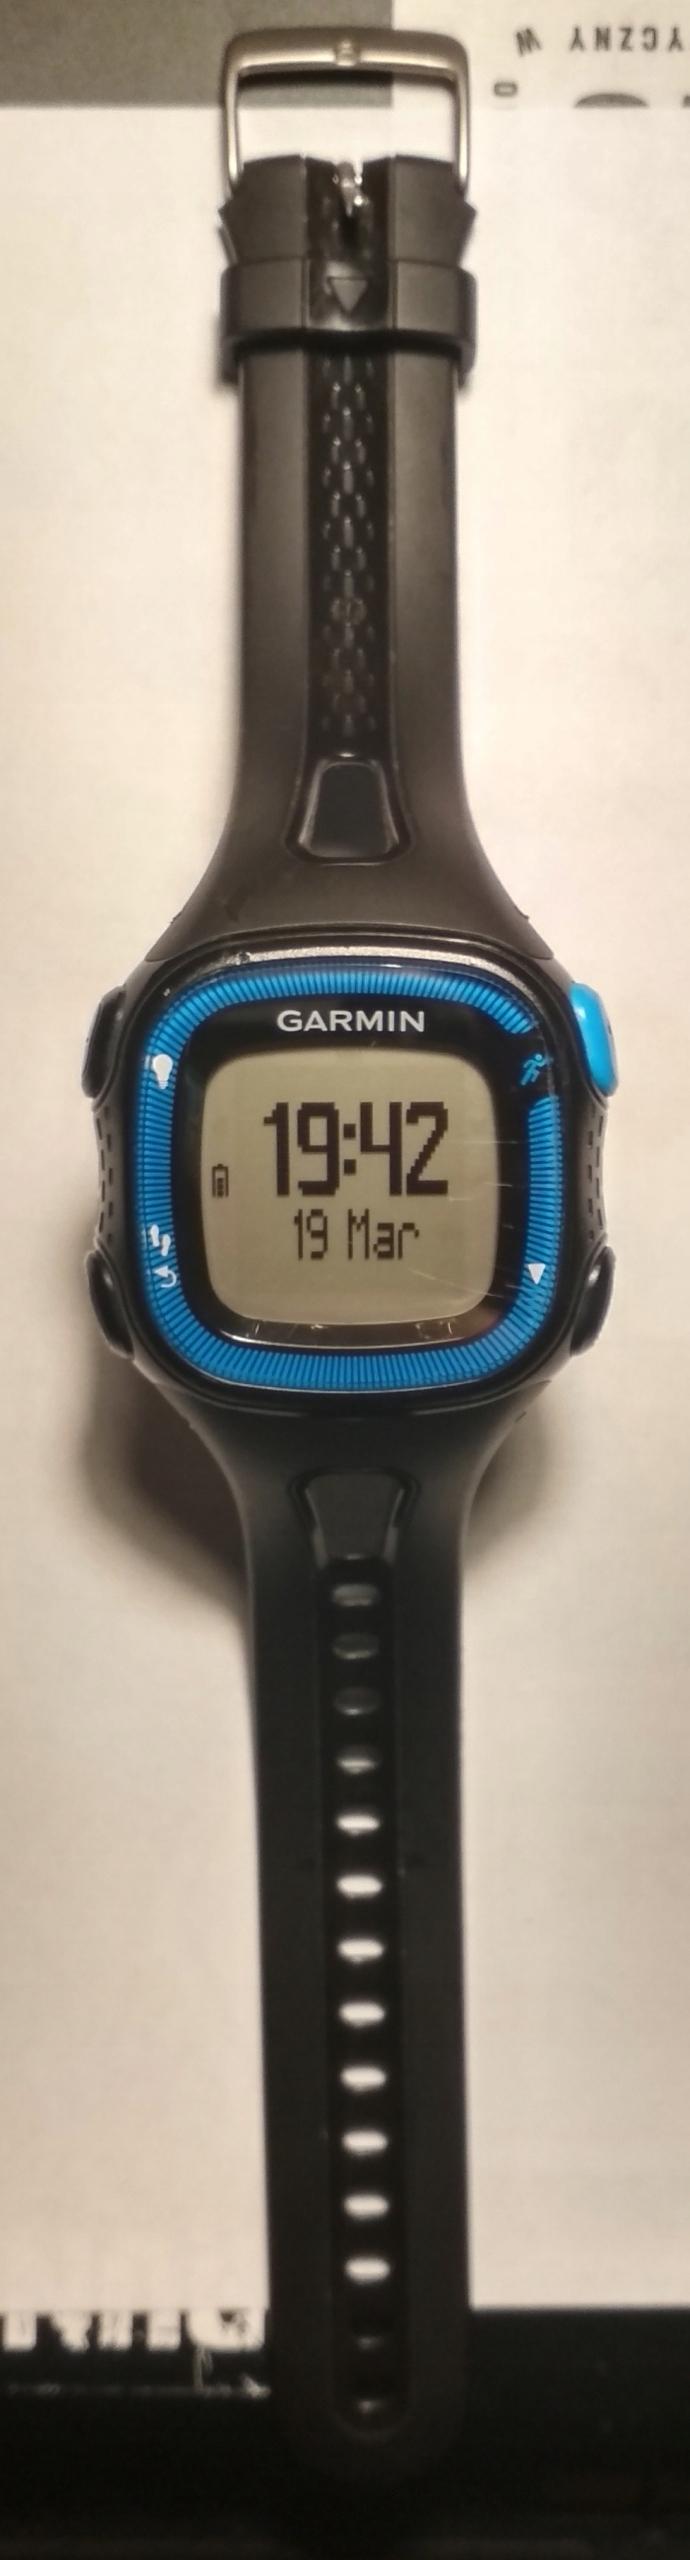 Zegarek Garmin Forerunner 15 GPS